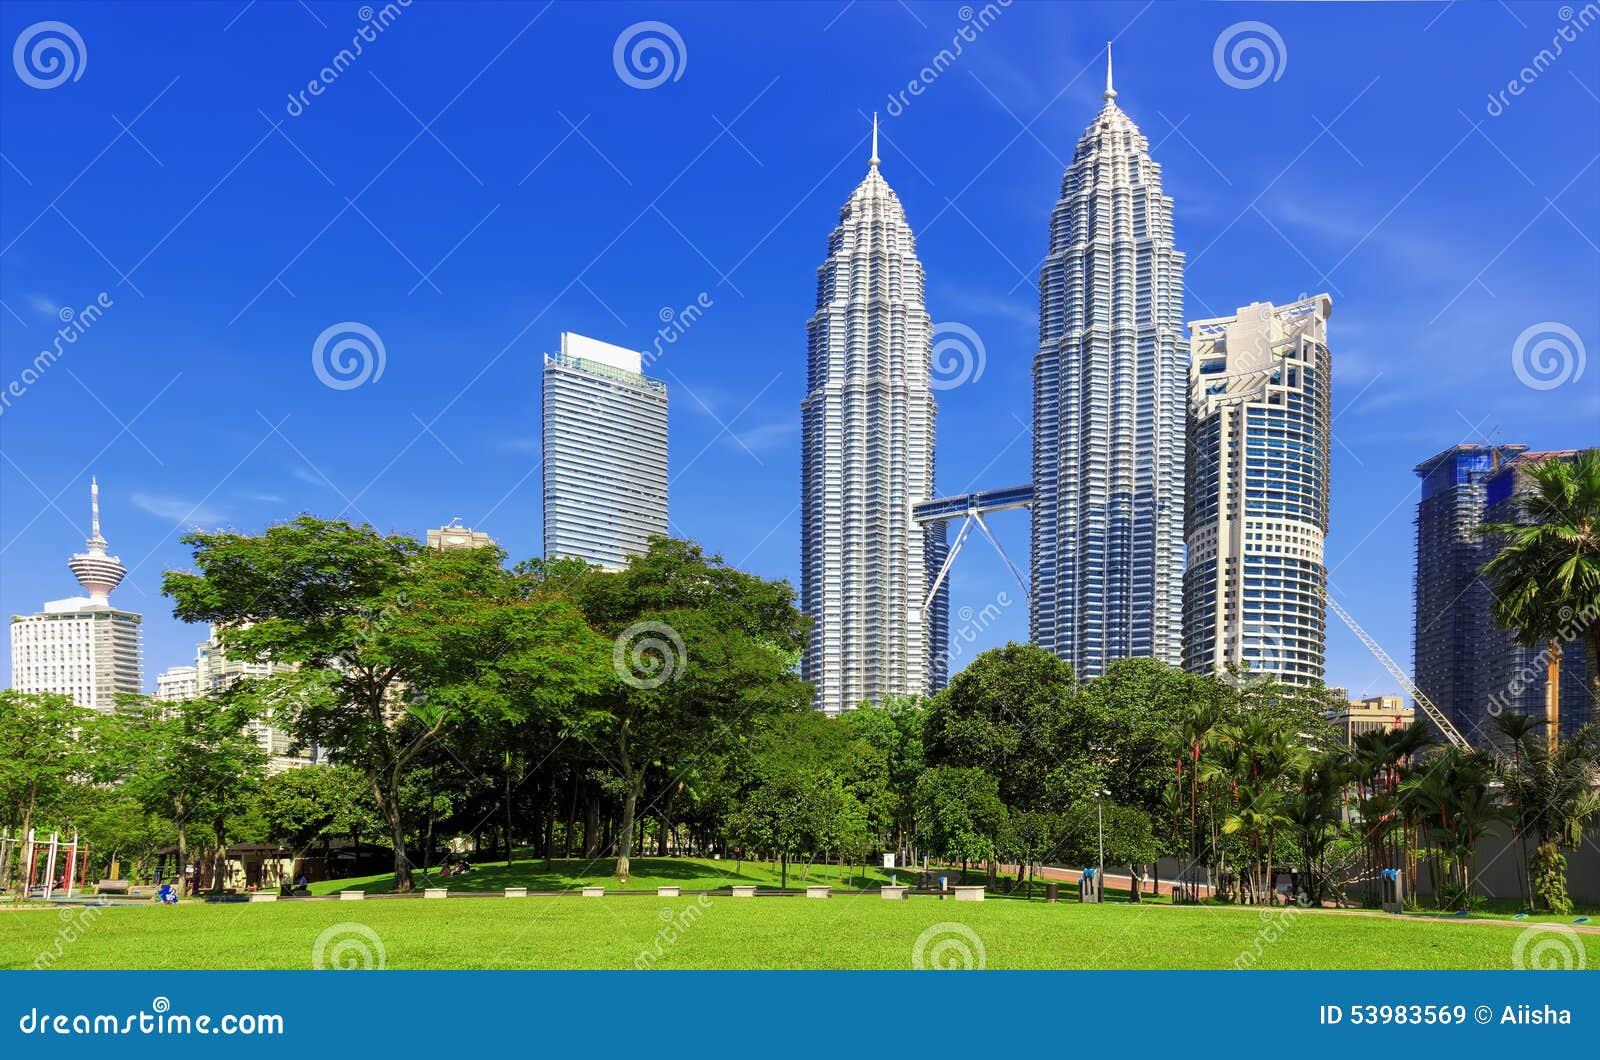 Petronas Twin Towers in Kuala Lumpur - KLCC Attractions